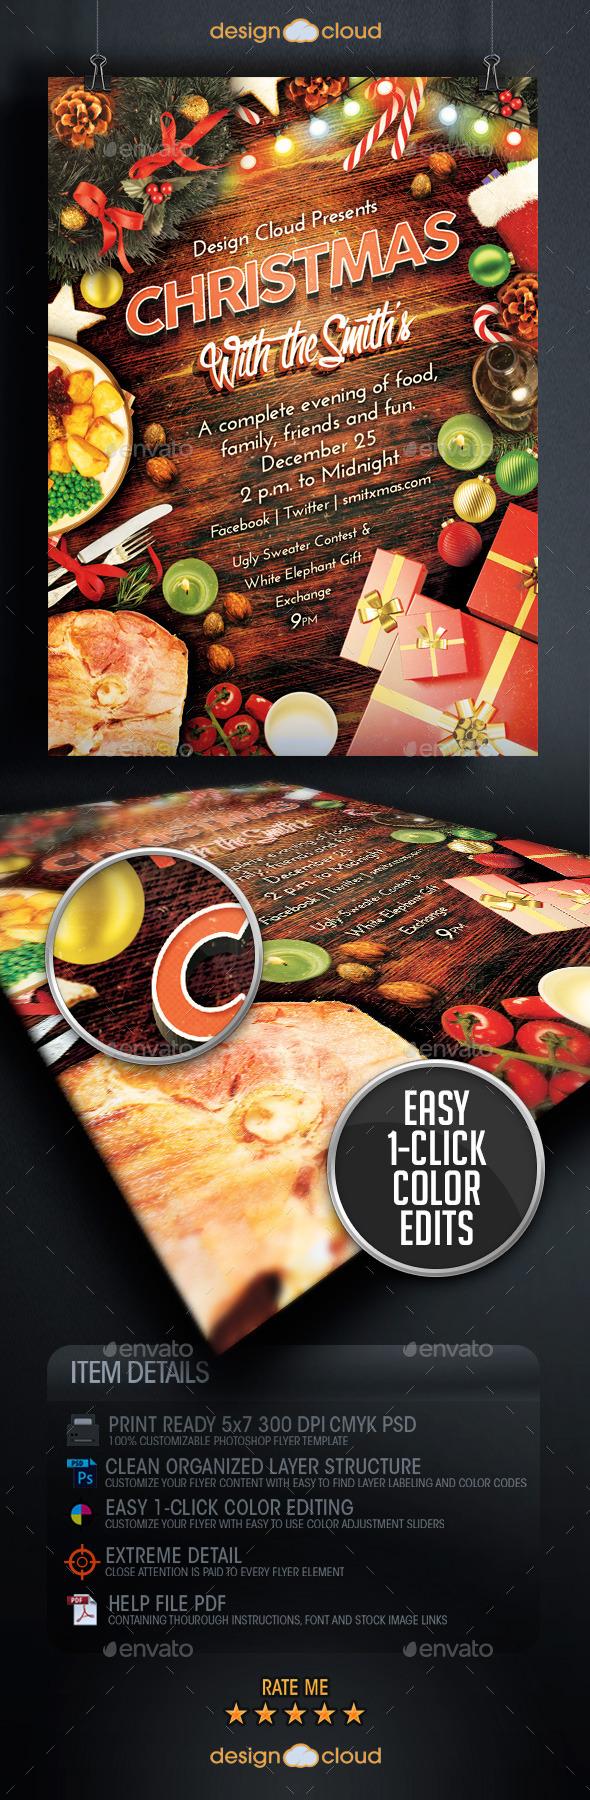 dinner flyer template